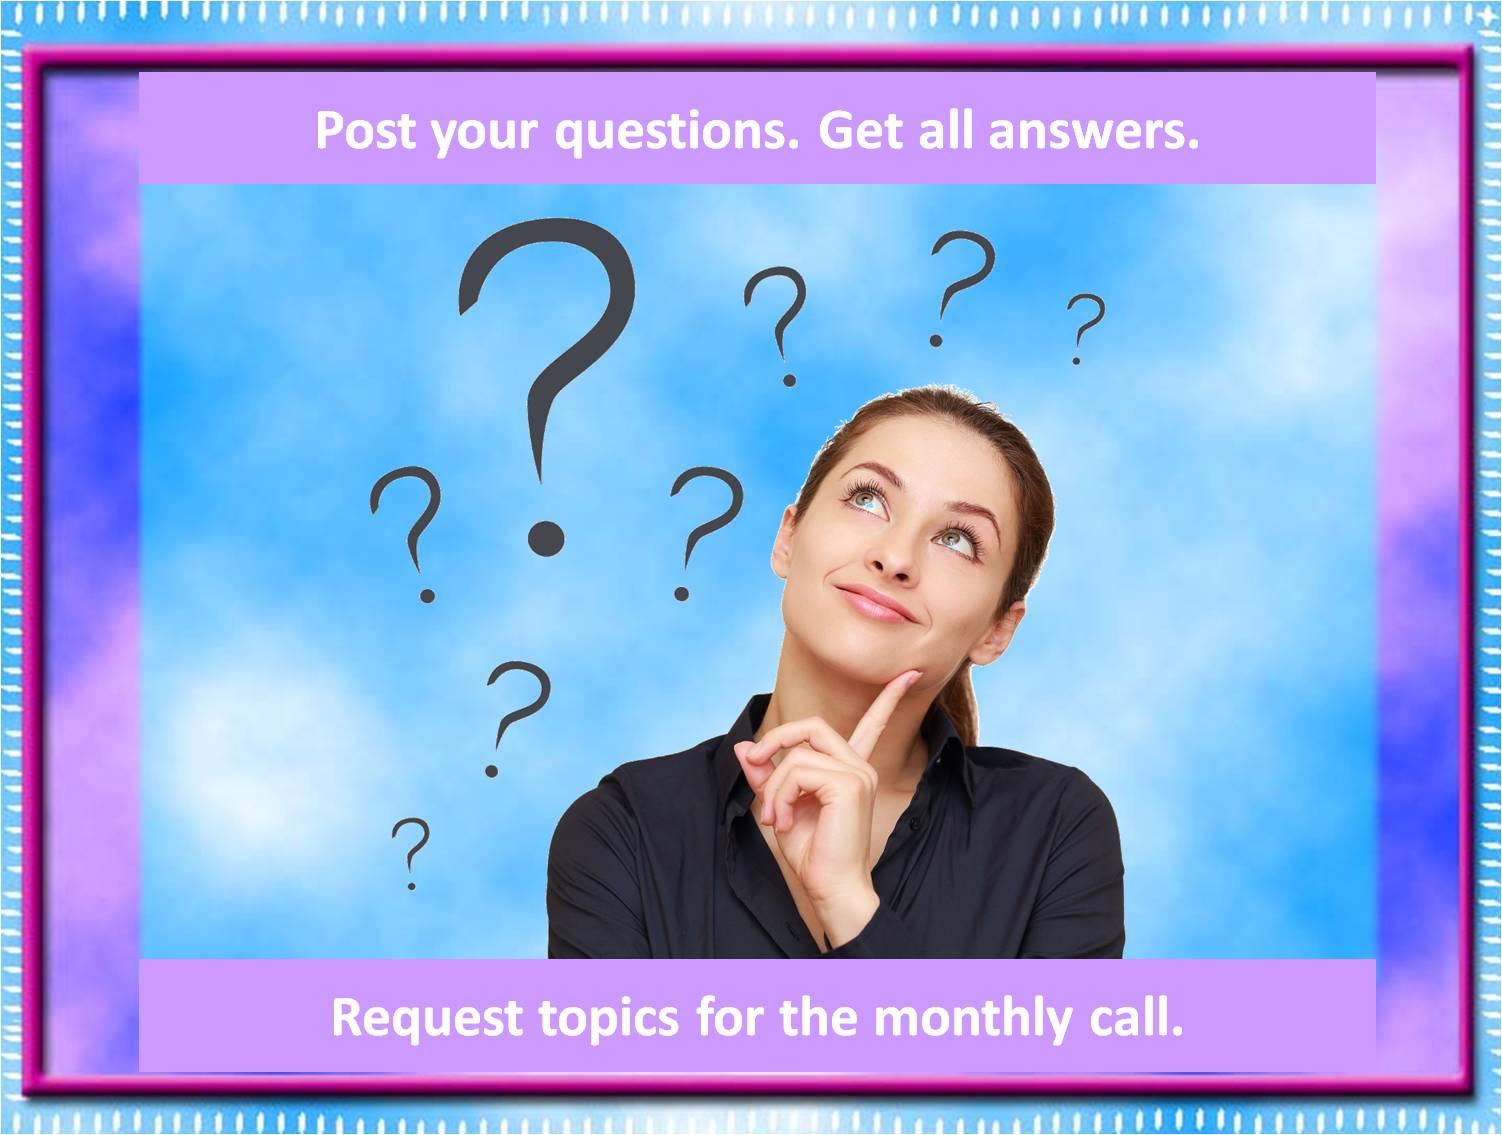 dreamexpress-virtualtourB-slide16-questions